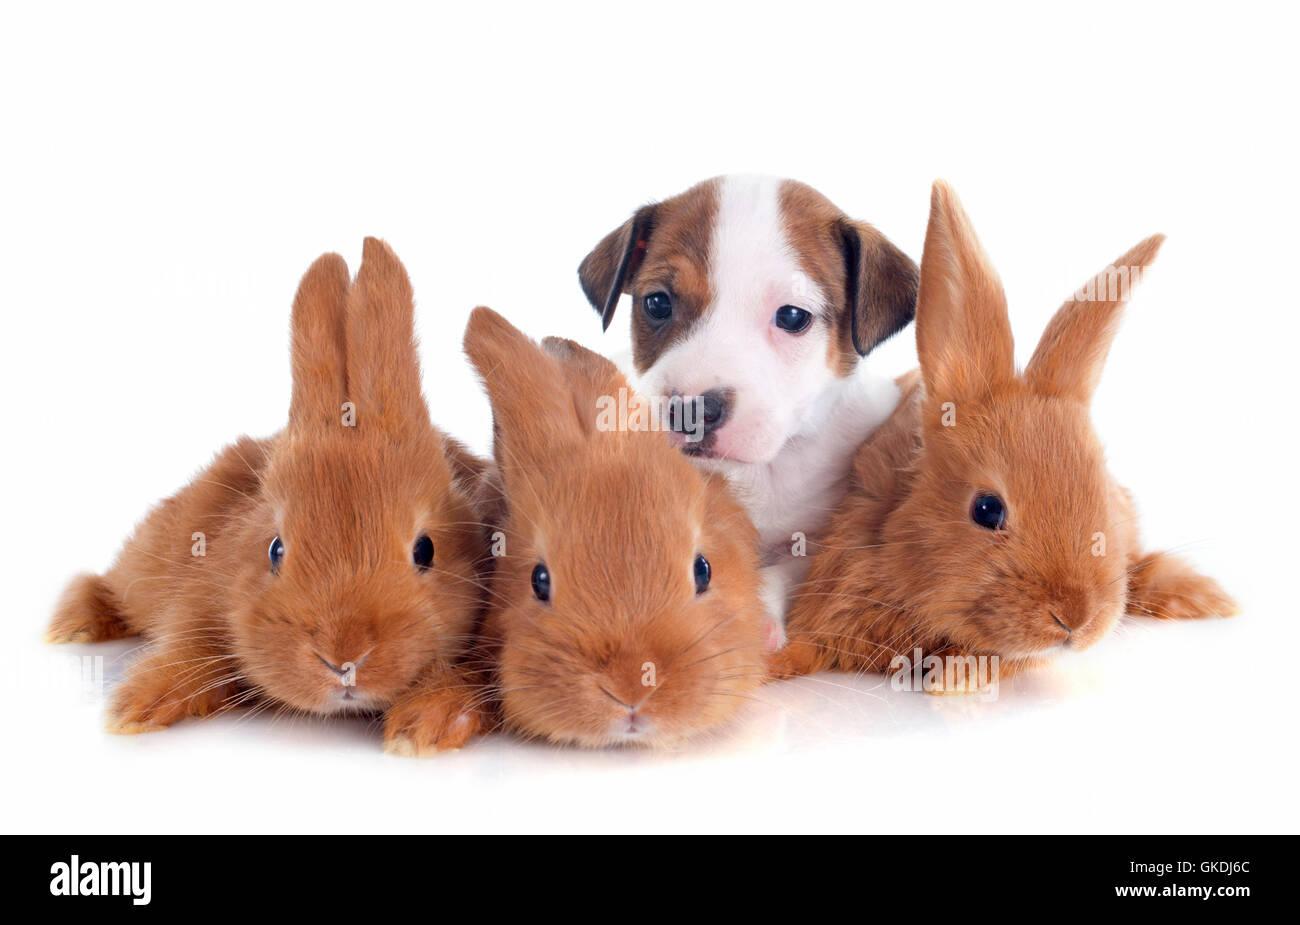 dog rabbit three - Stock Image